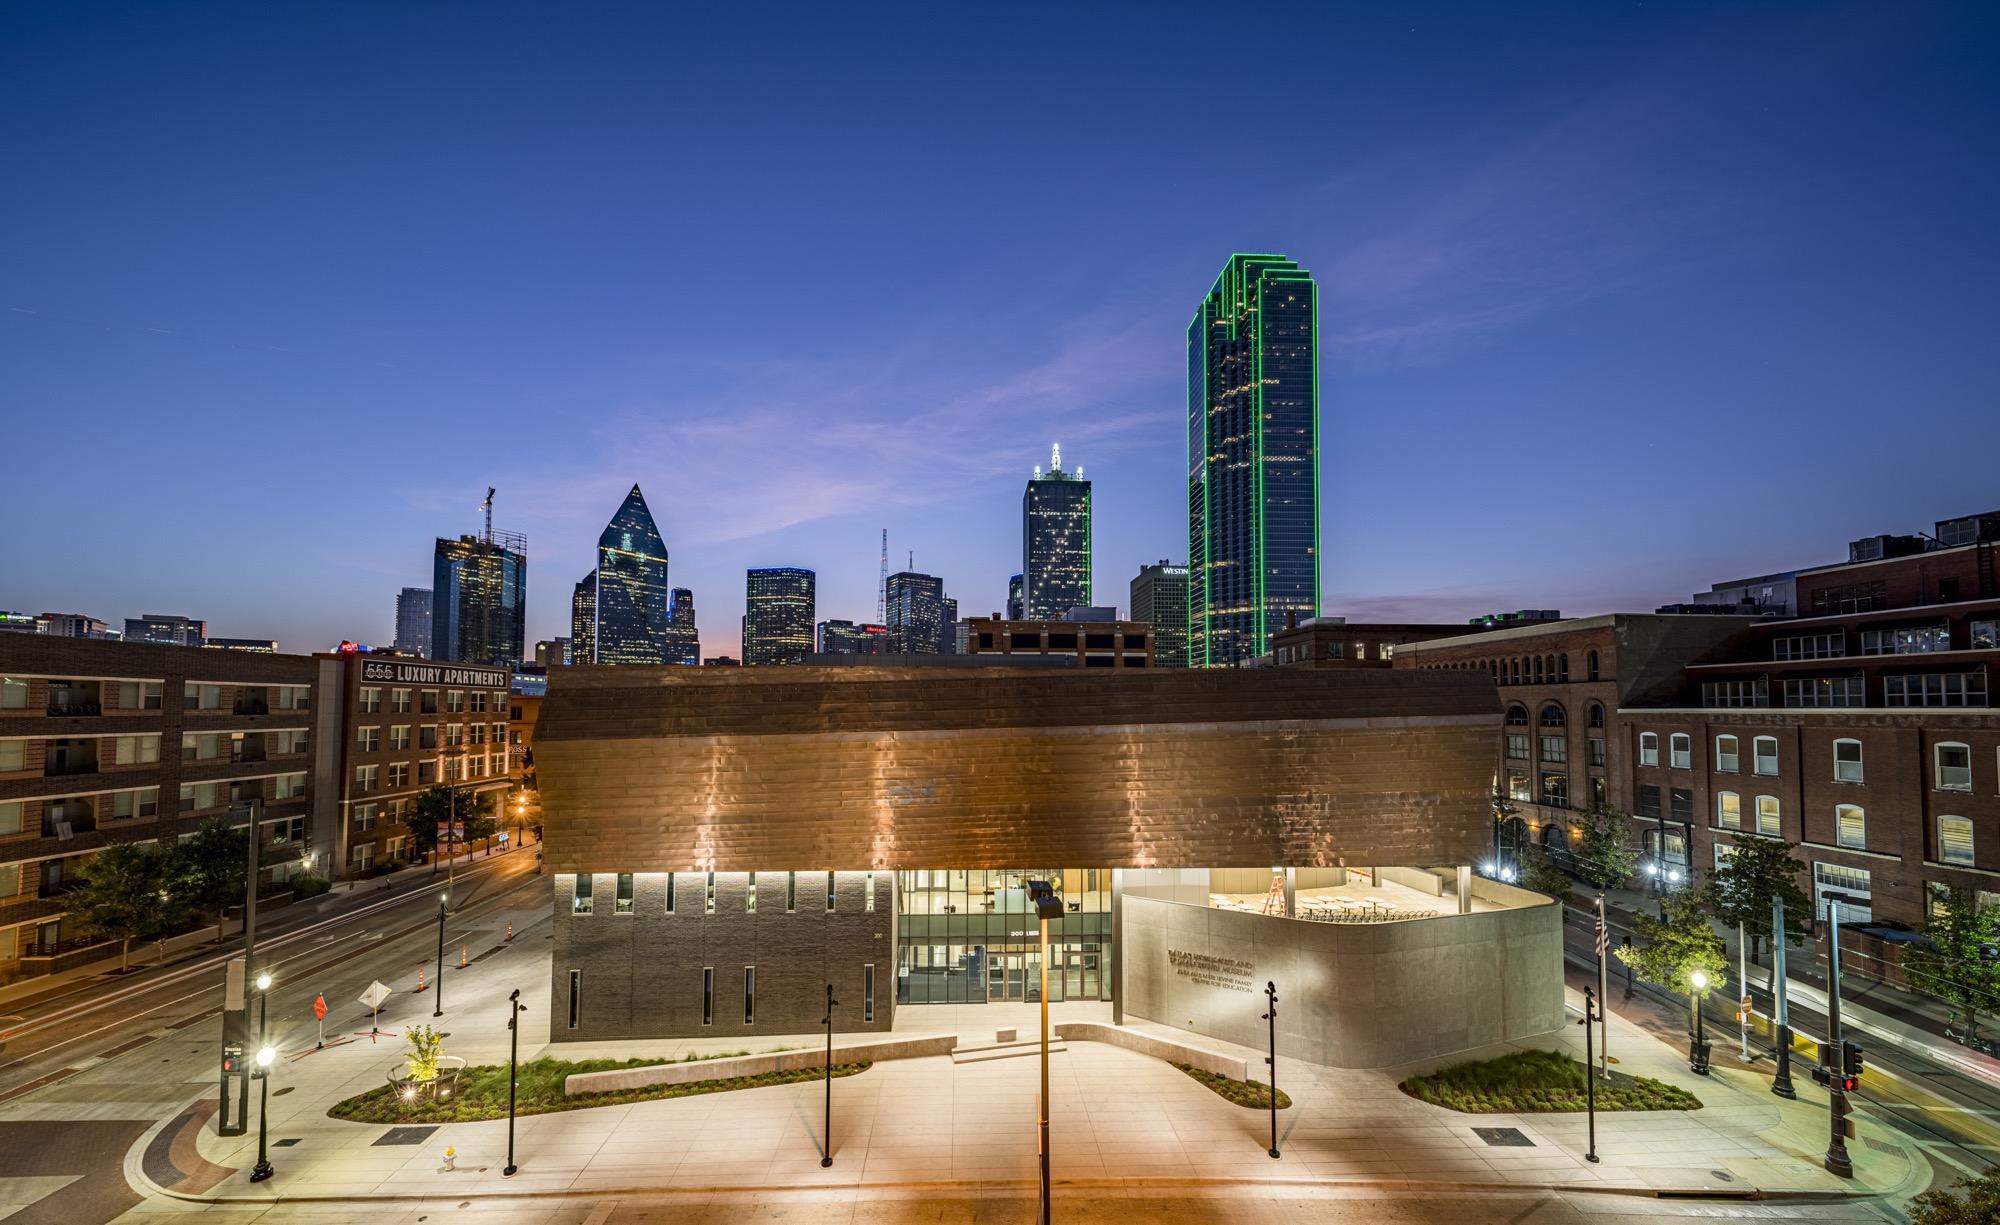 Neues Dallas Holocaust and Human Rights Museum eröffnet